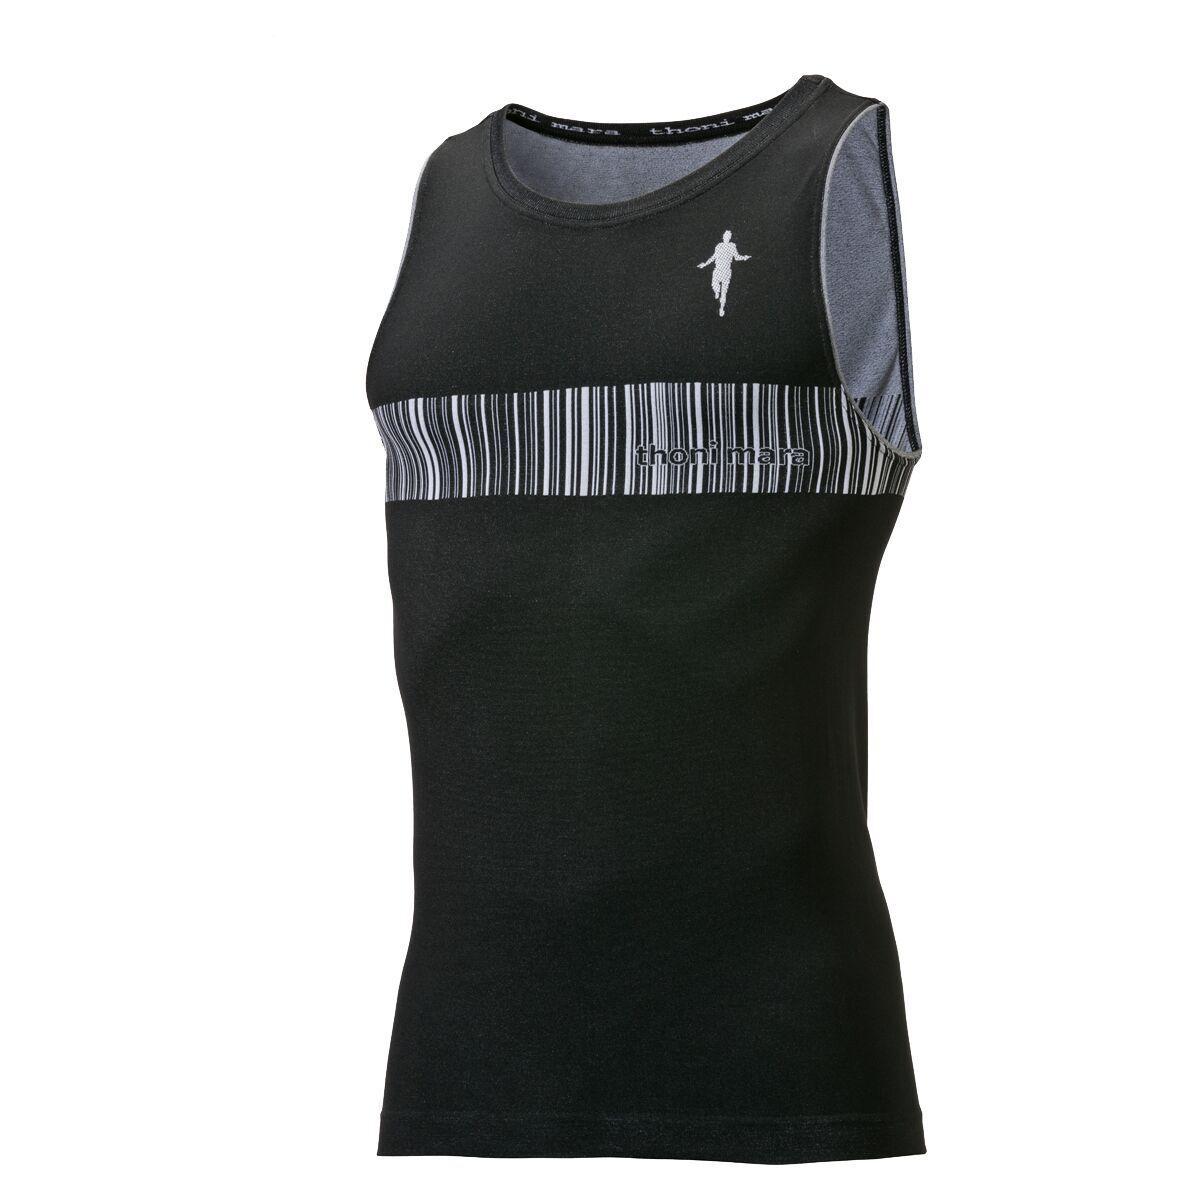 Thonimara Sommer OA Shirt EAN in Schwarz